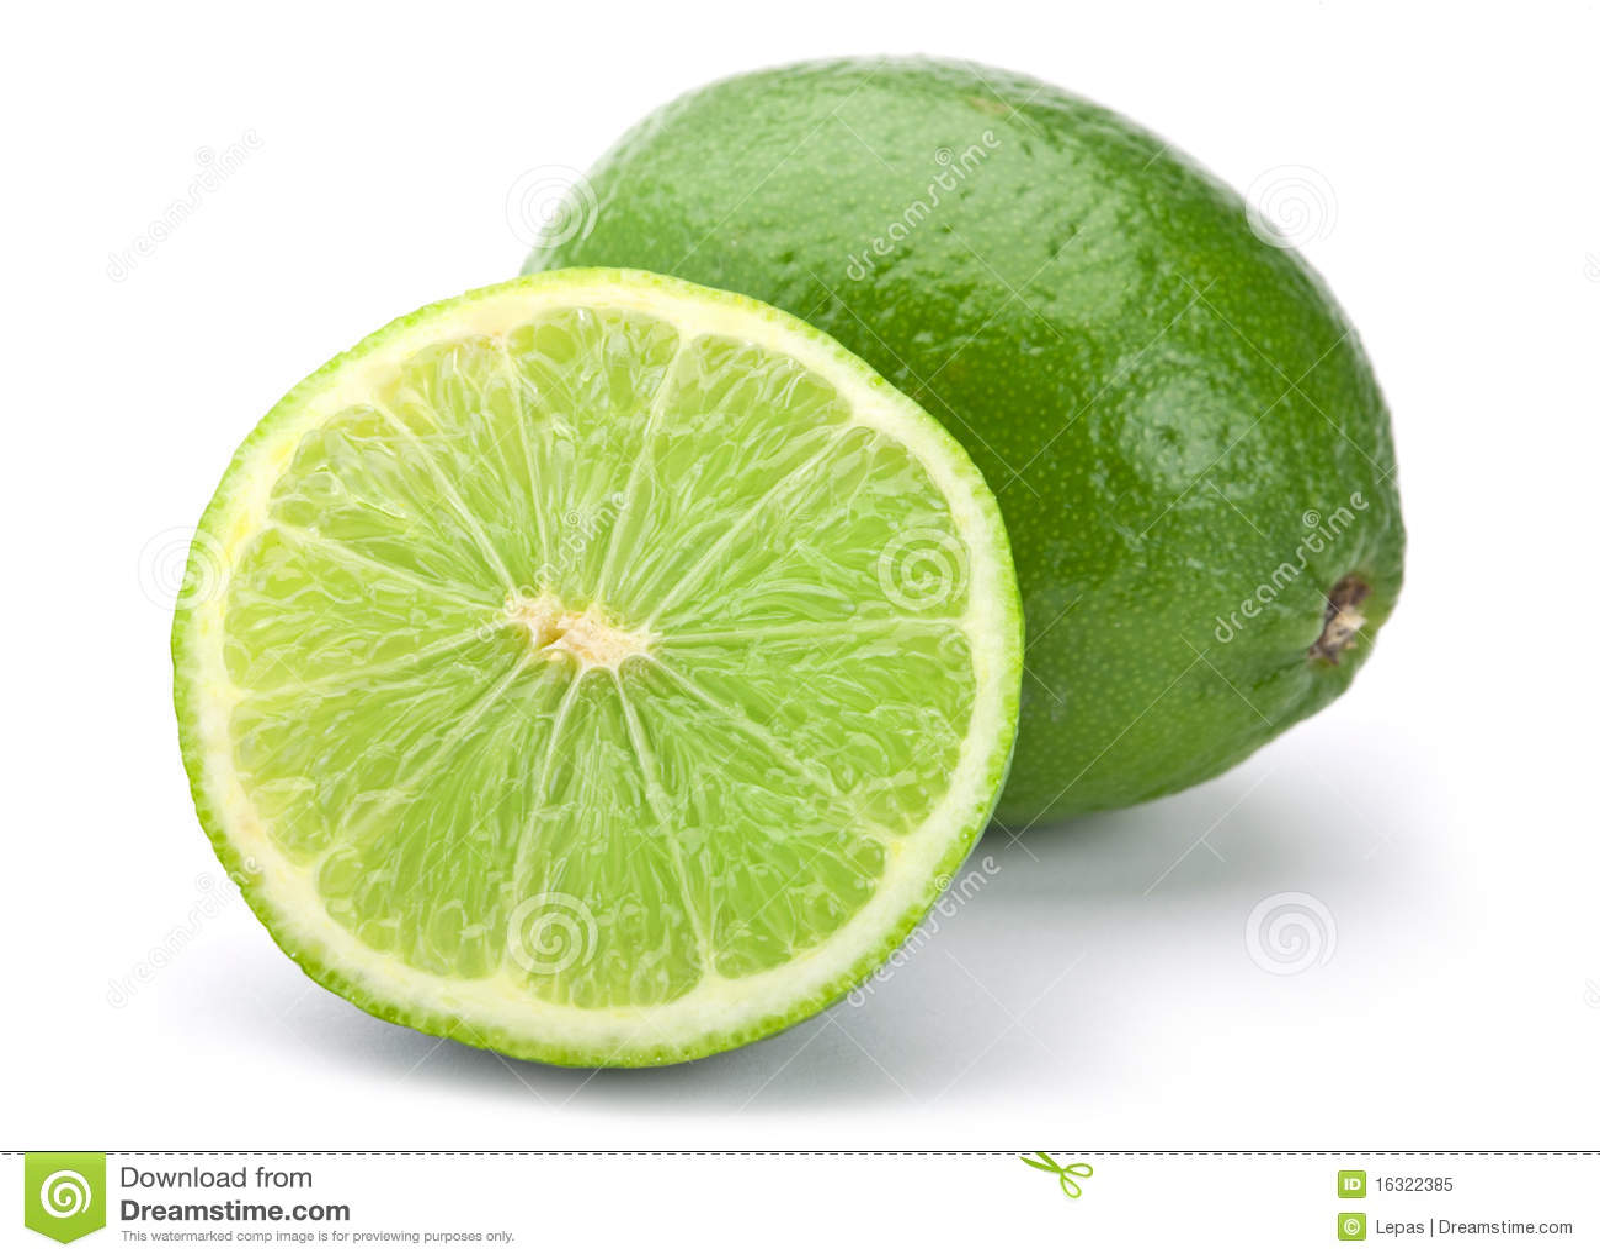 Lime Citrus Fruit Royalty Free Stock Photo - Image: 16322385